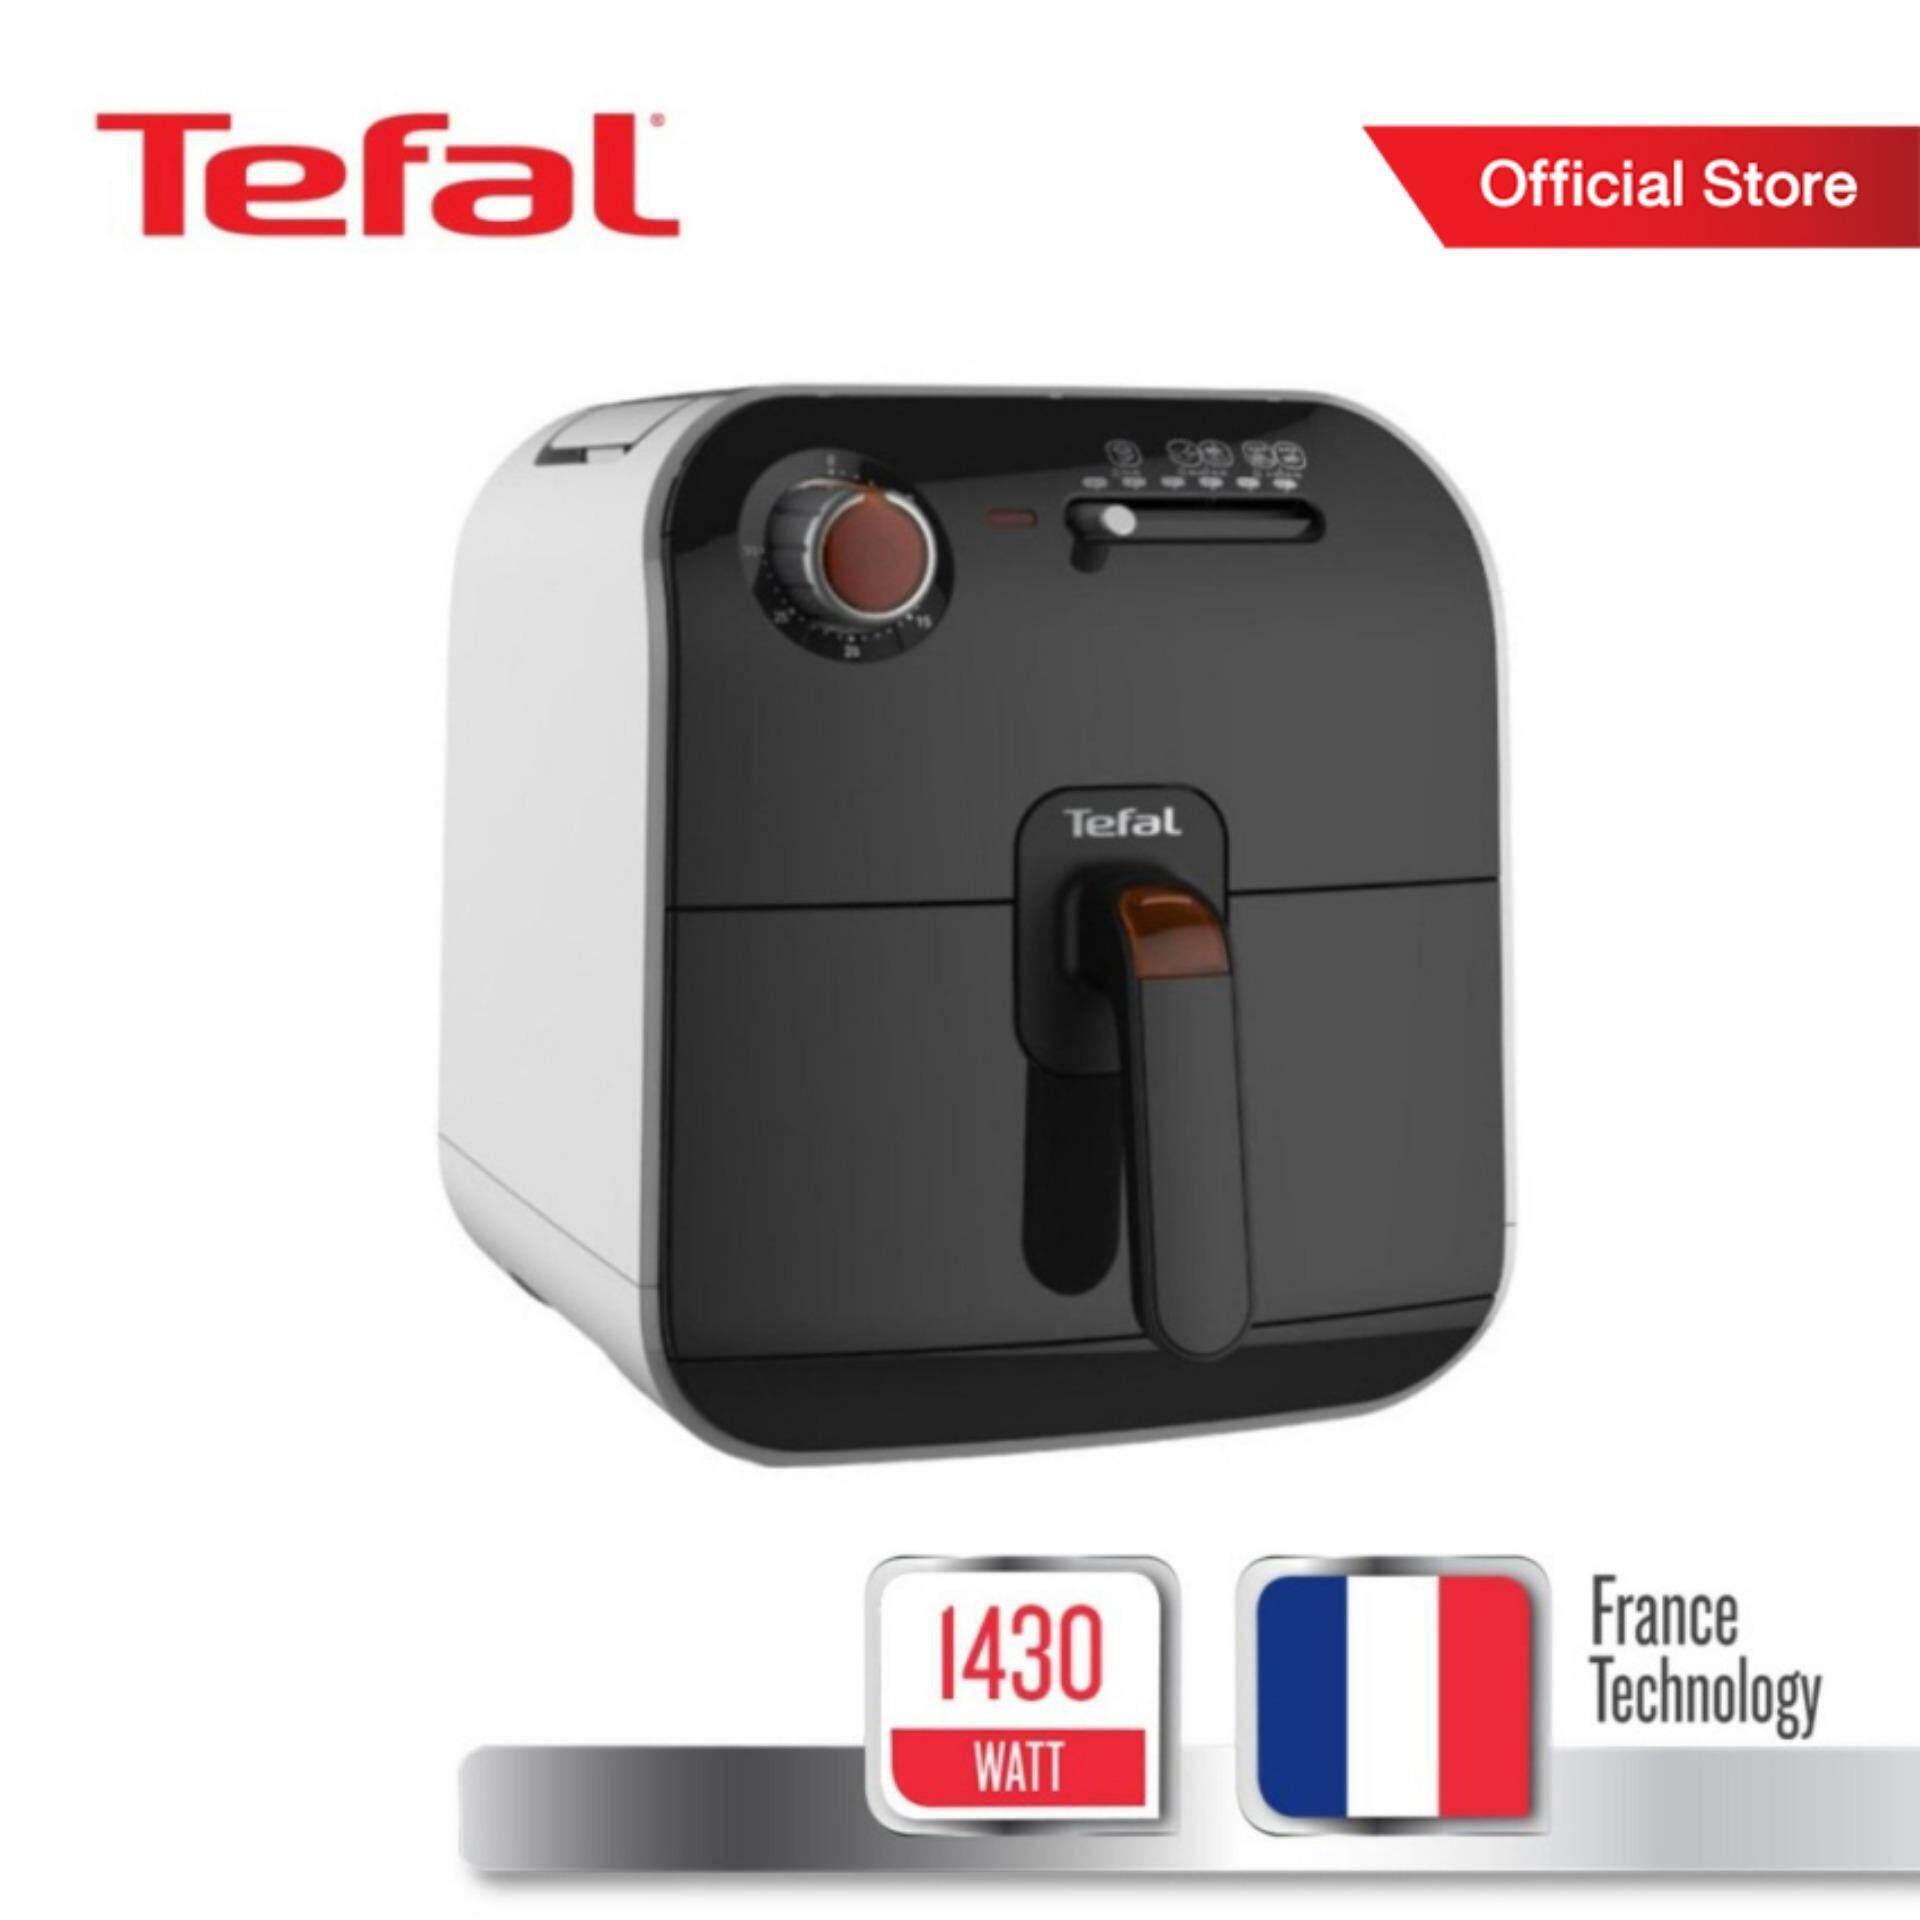 Tefal หม้อทอดไร้น้ำมัน กำลังไฟ 1430 วัตต์ ขนาดความจุ 800 กรัม รุ่น Fx1000 -Black By Tefal Official Store.